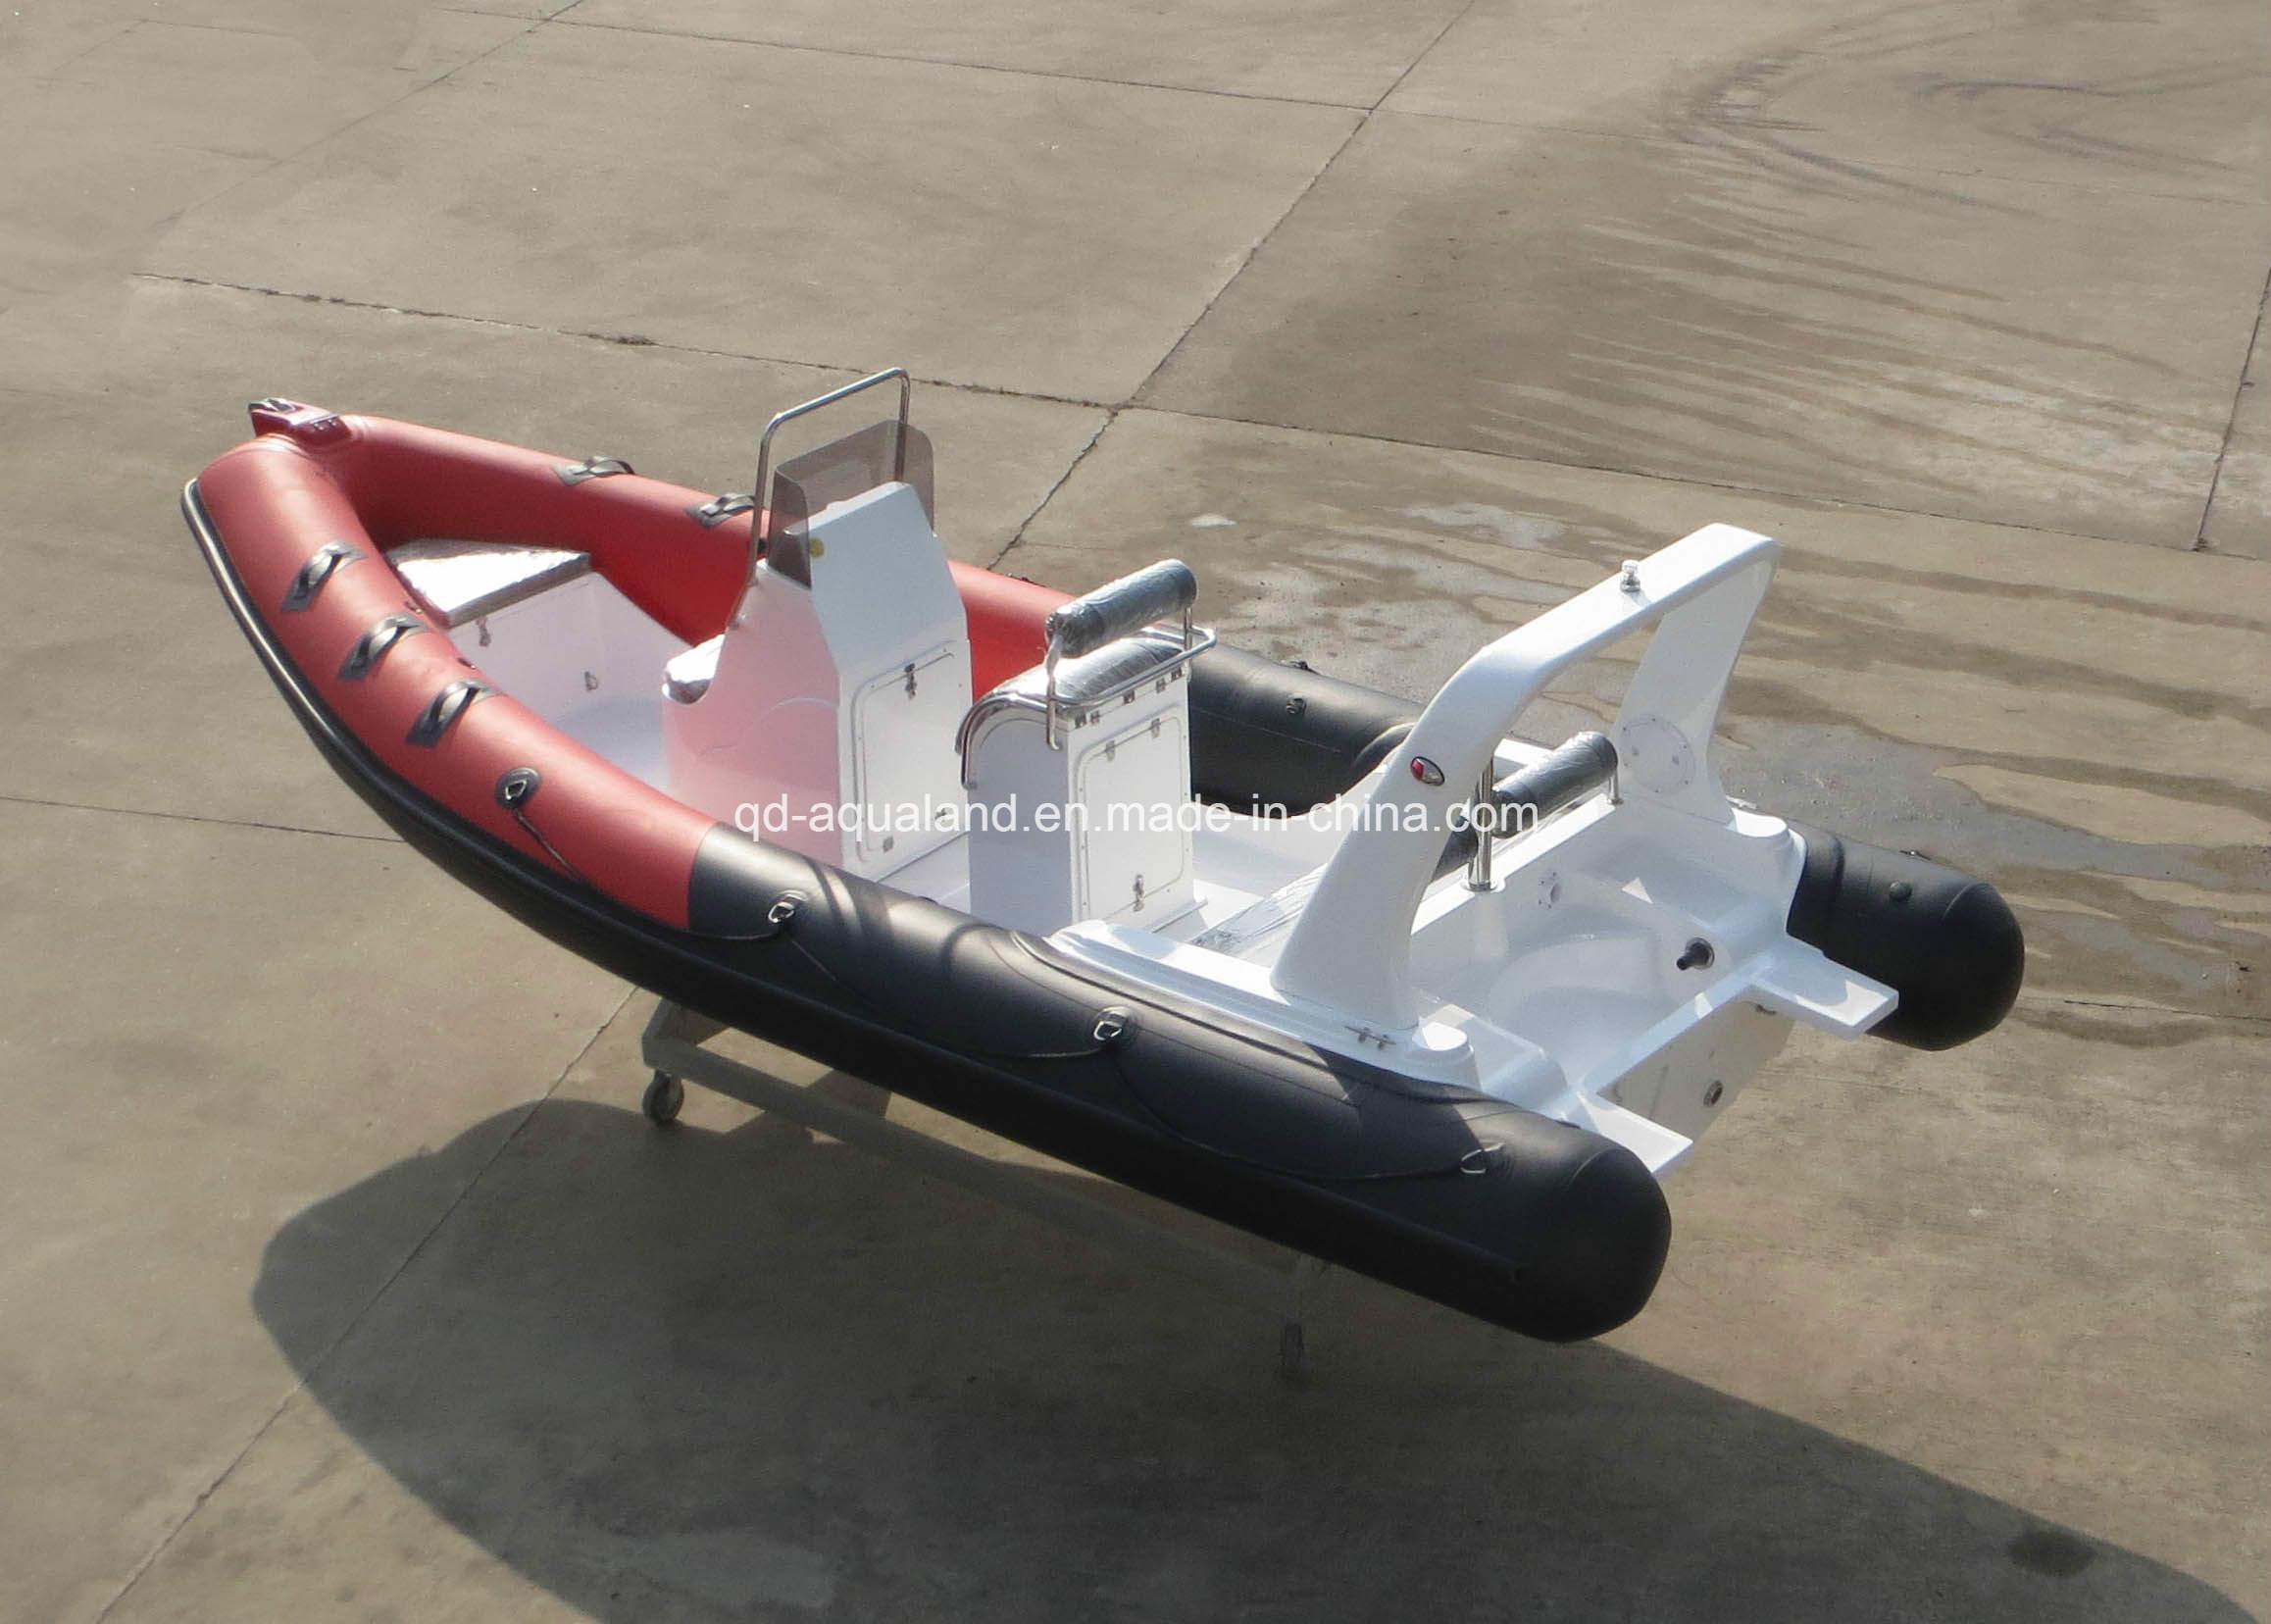 China Aqualand 20 Feet 6.2m Rigid Inflatable Fishing Boat/Rib Motor Boat/Speed Rescue/Patrol Boat (RIB620D)